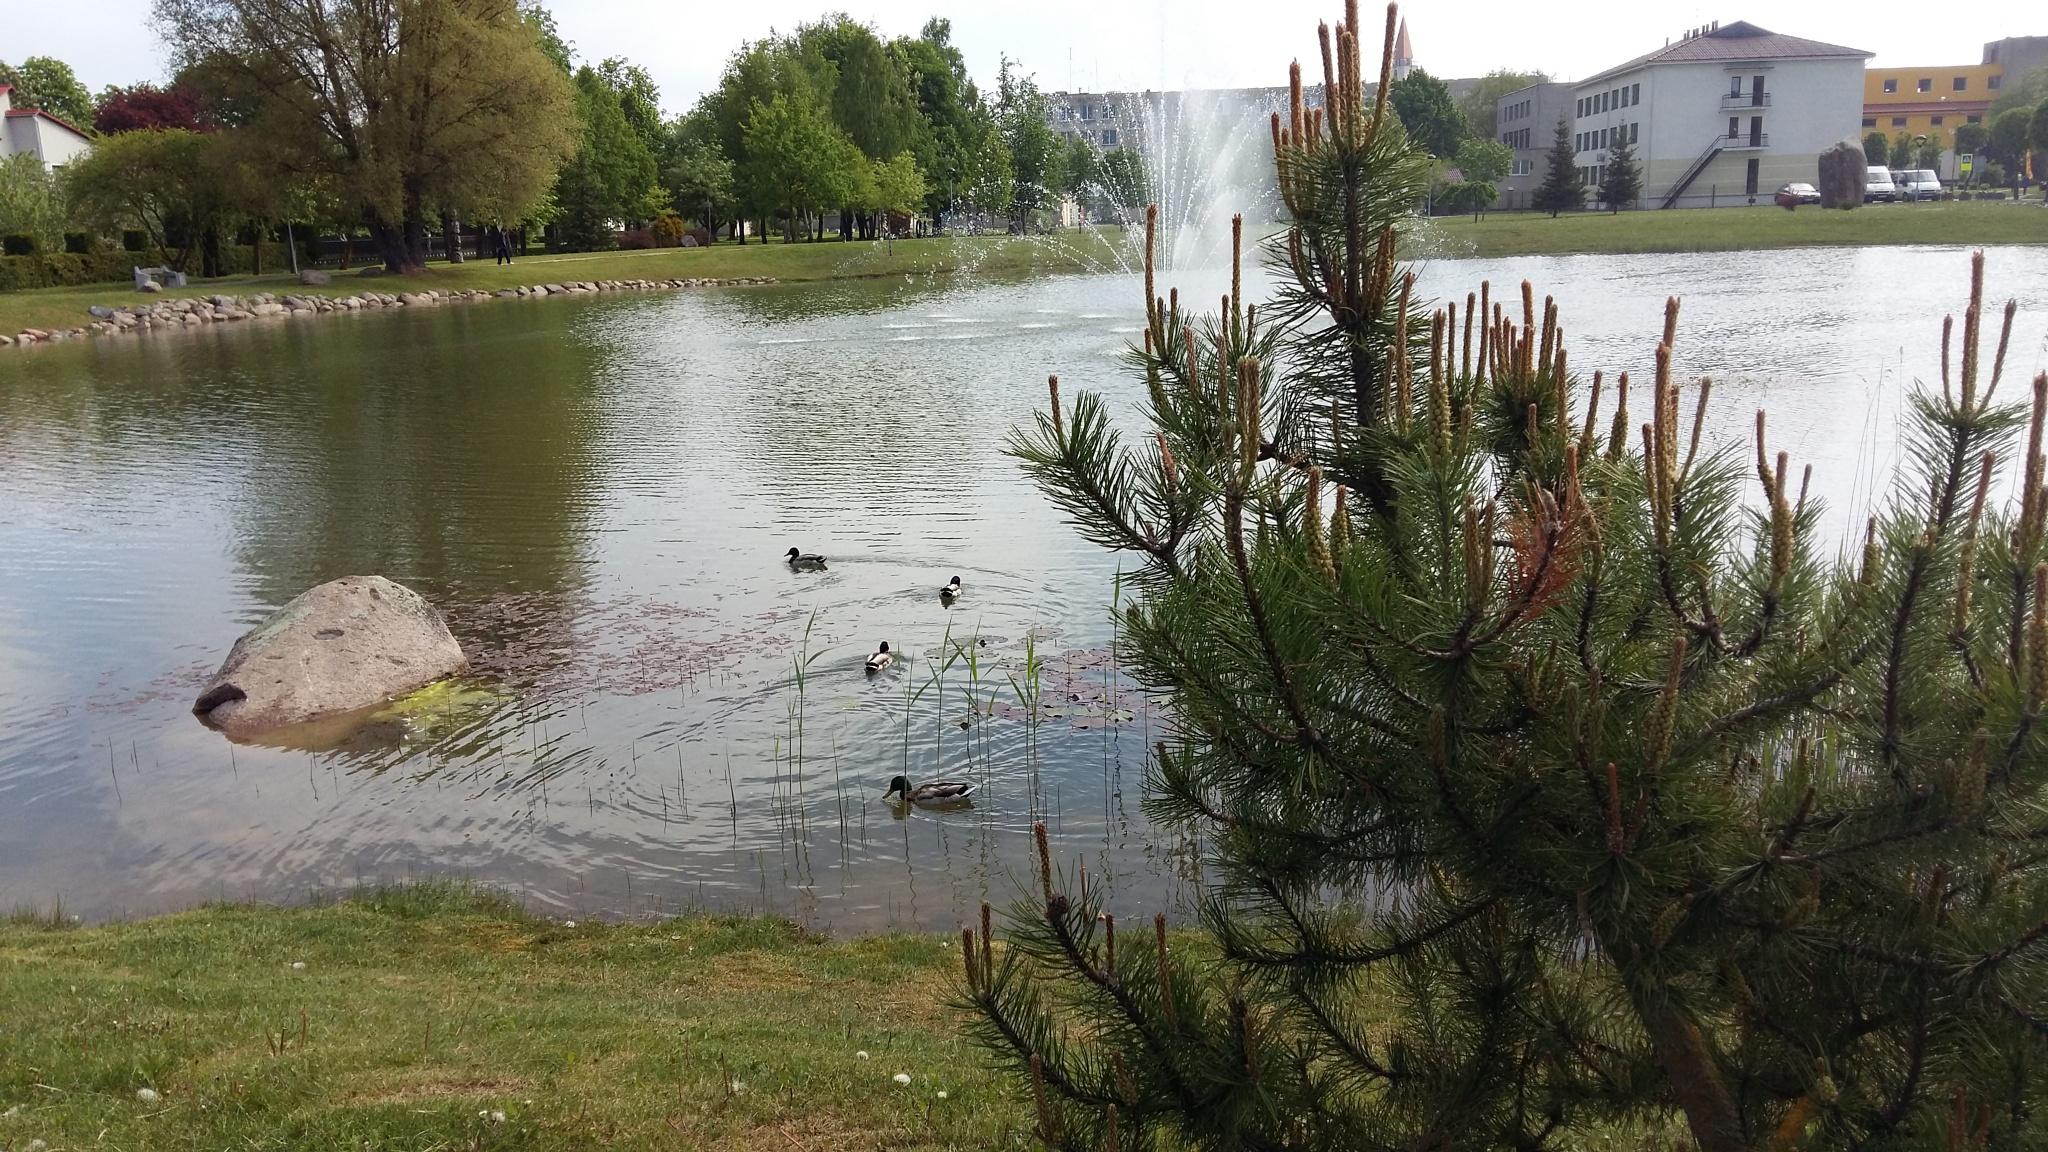 Pond in city. by uzkuraitiene62